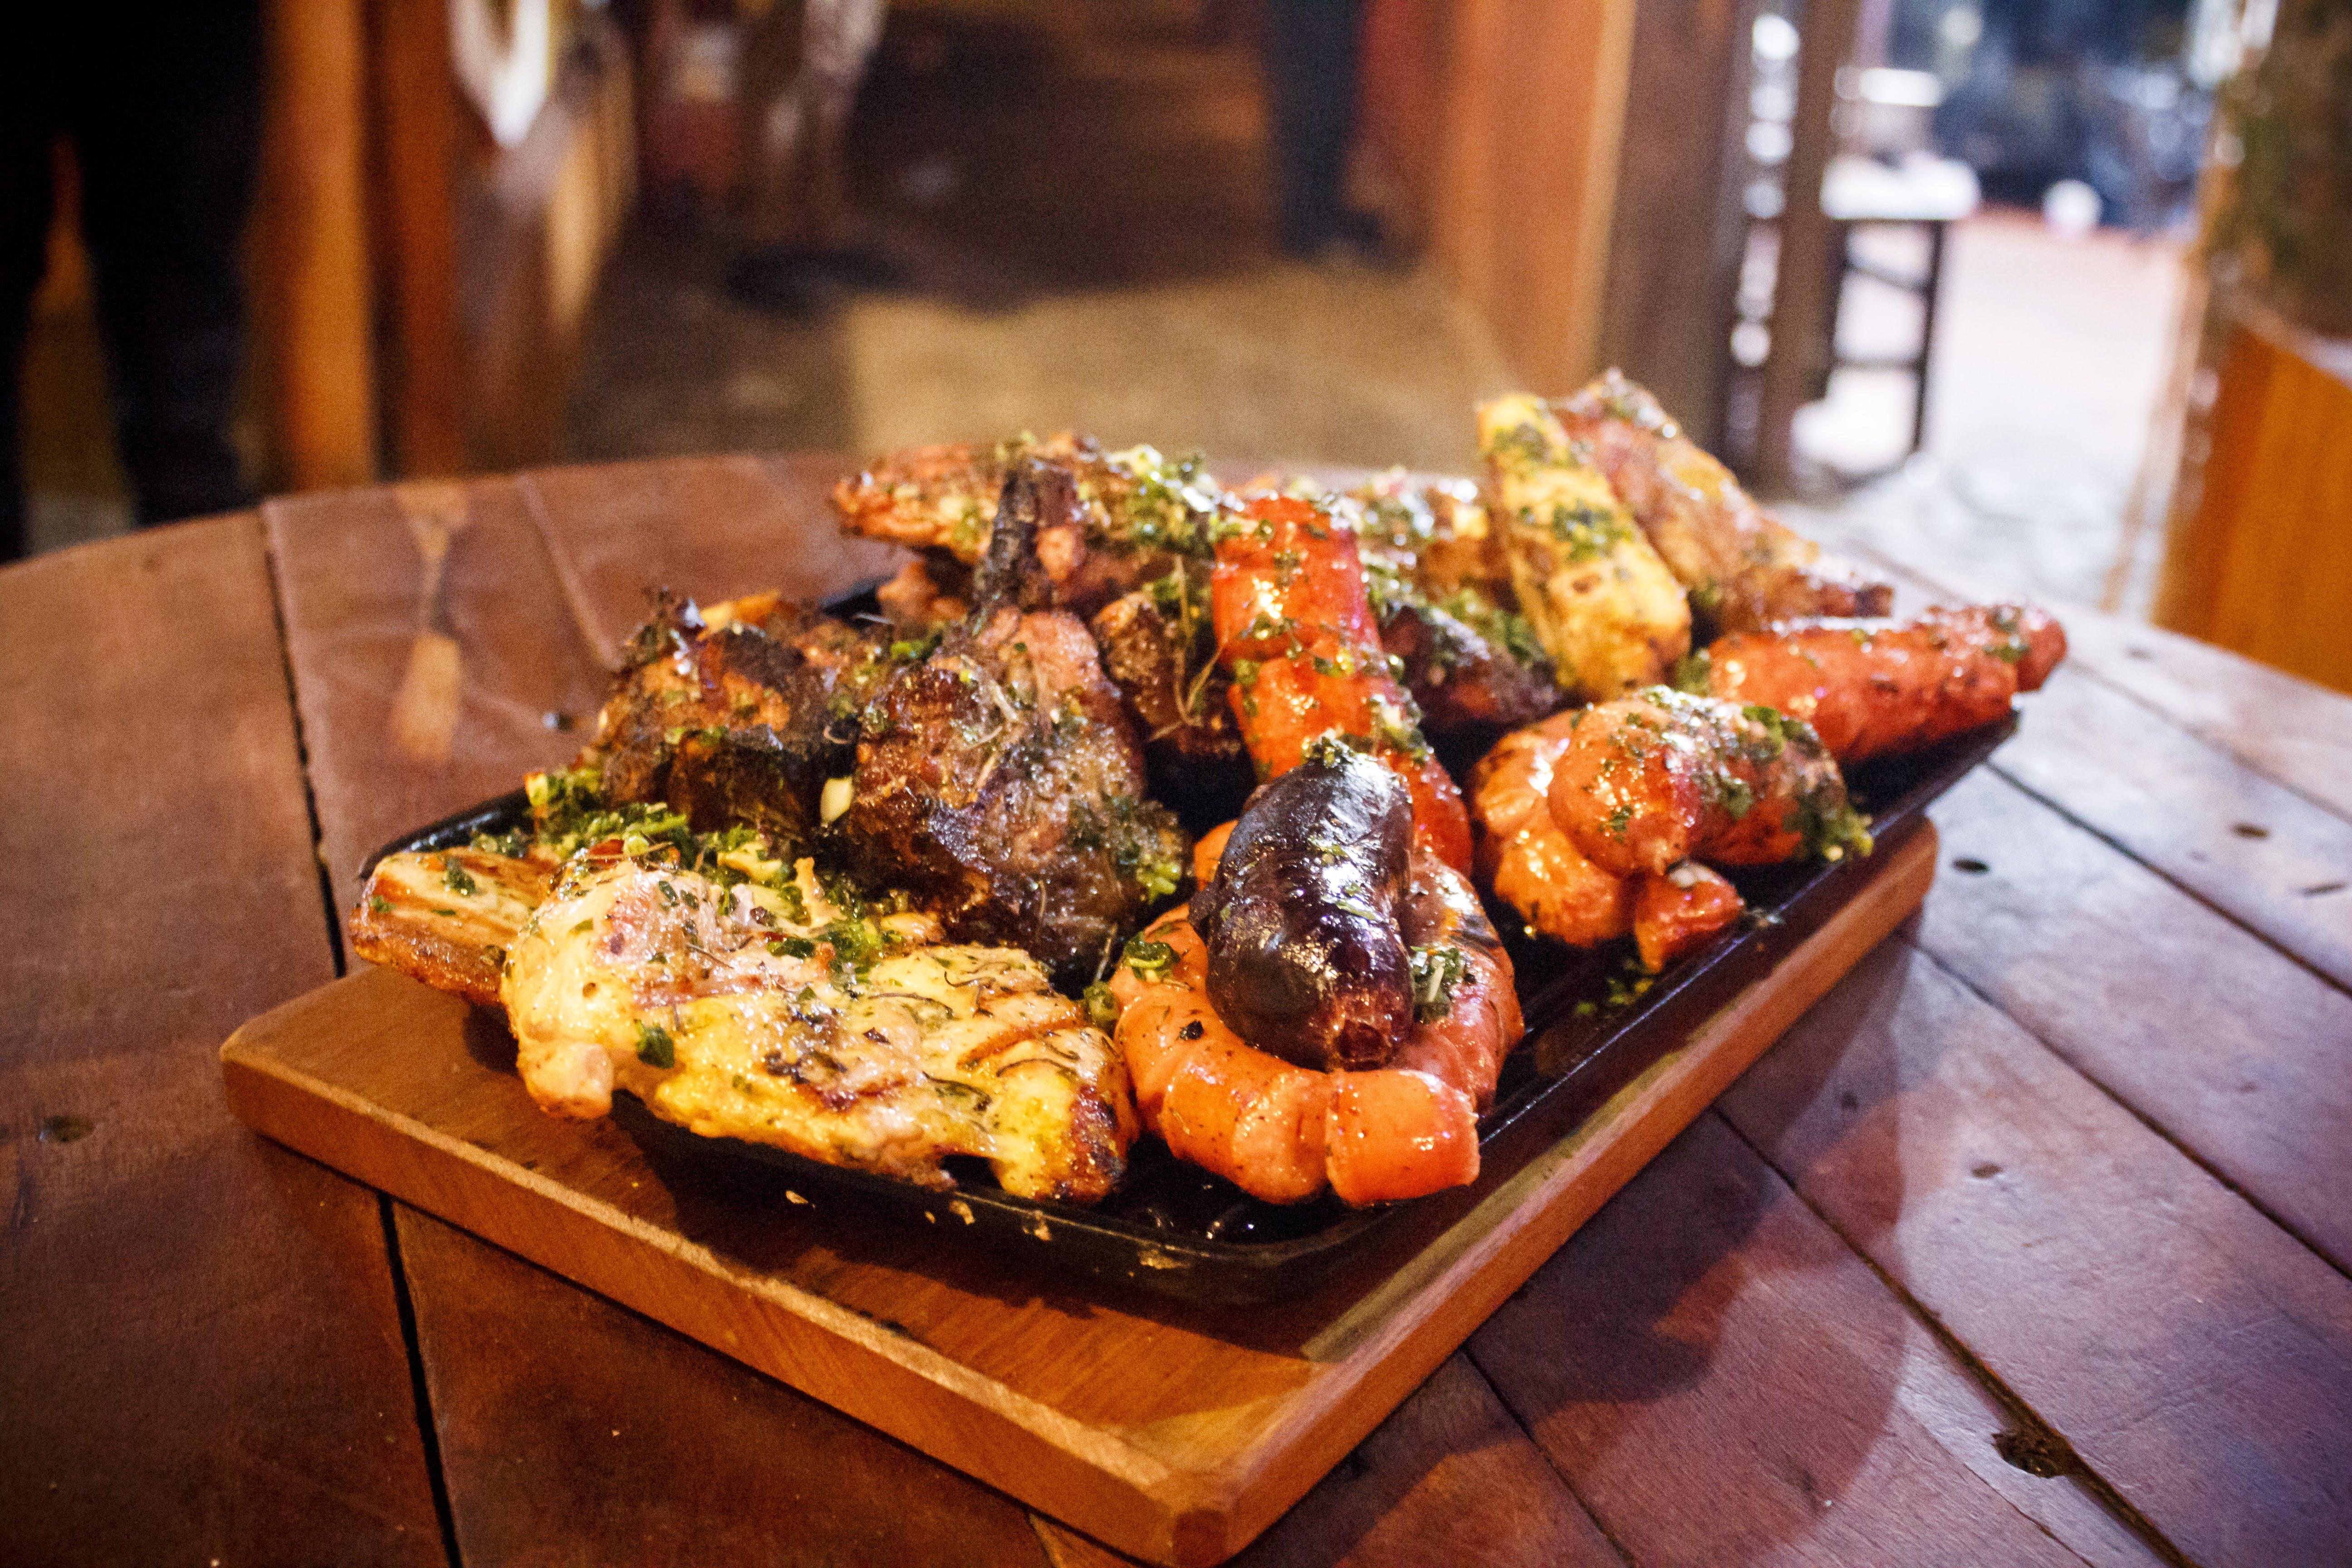 Безкоштовне стокове фото на тему «їжа, гурман, м'ясо, Ресторан»